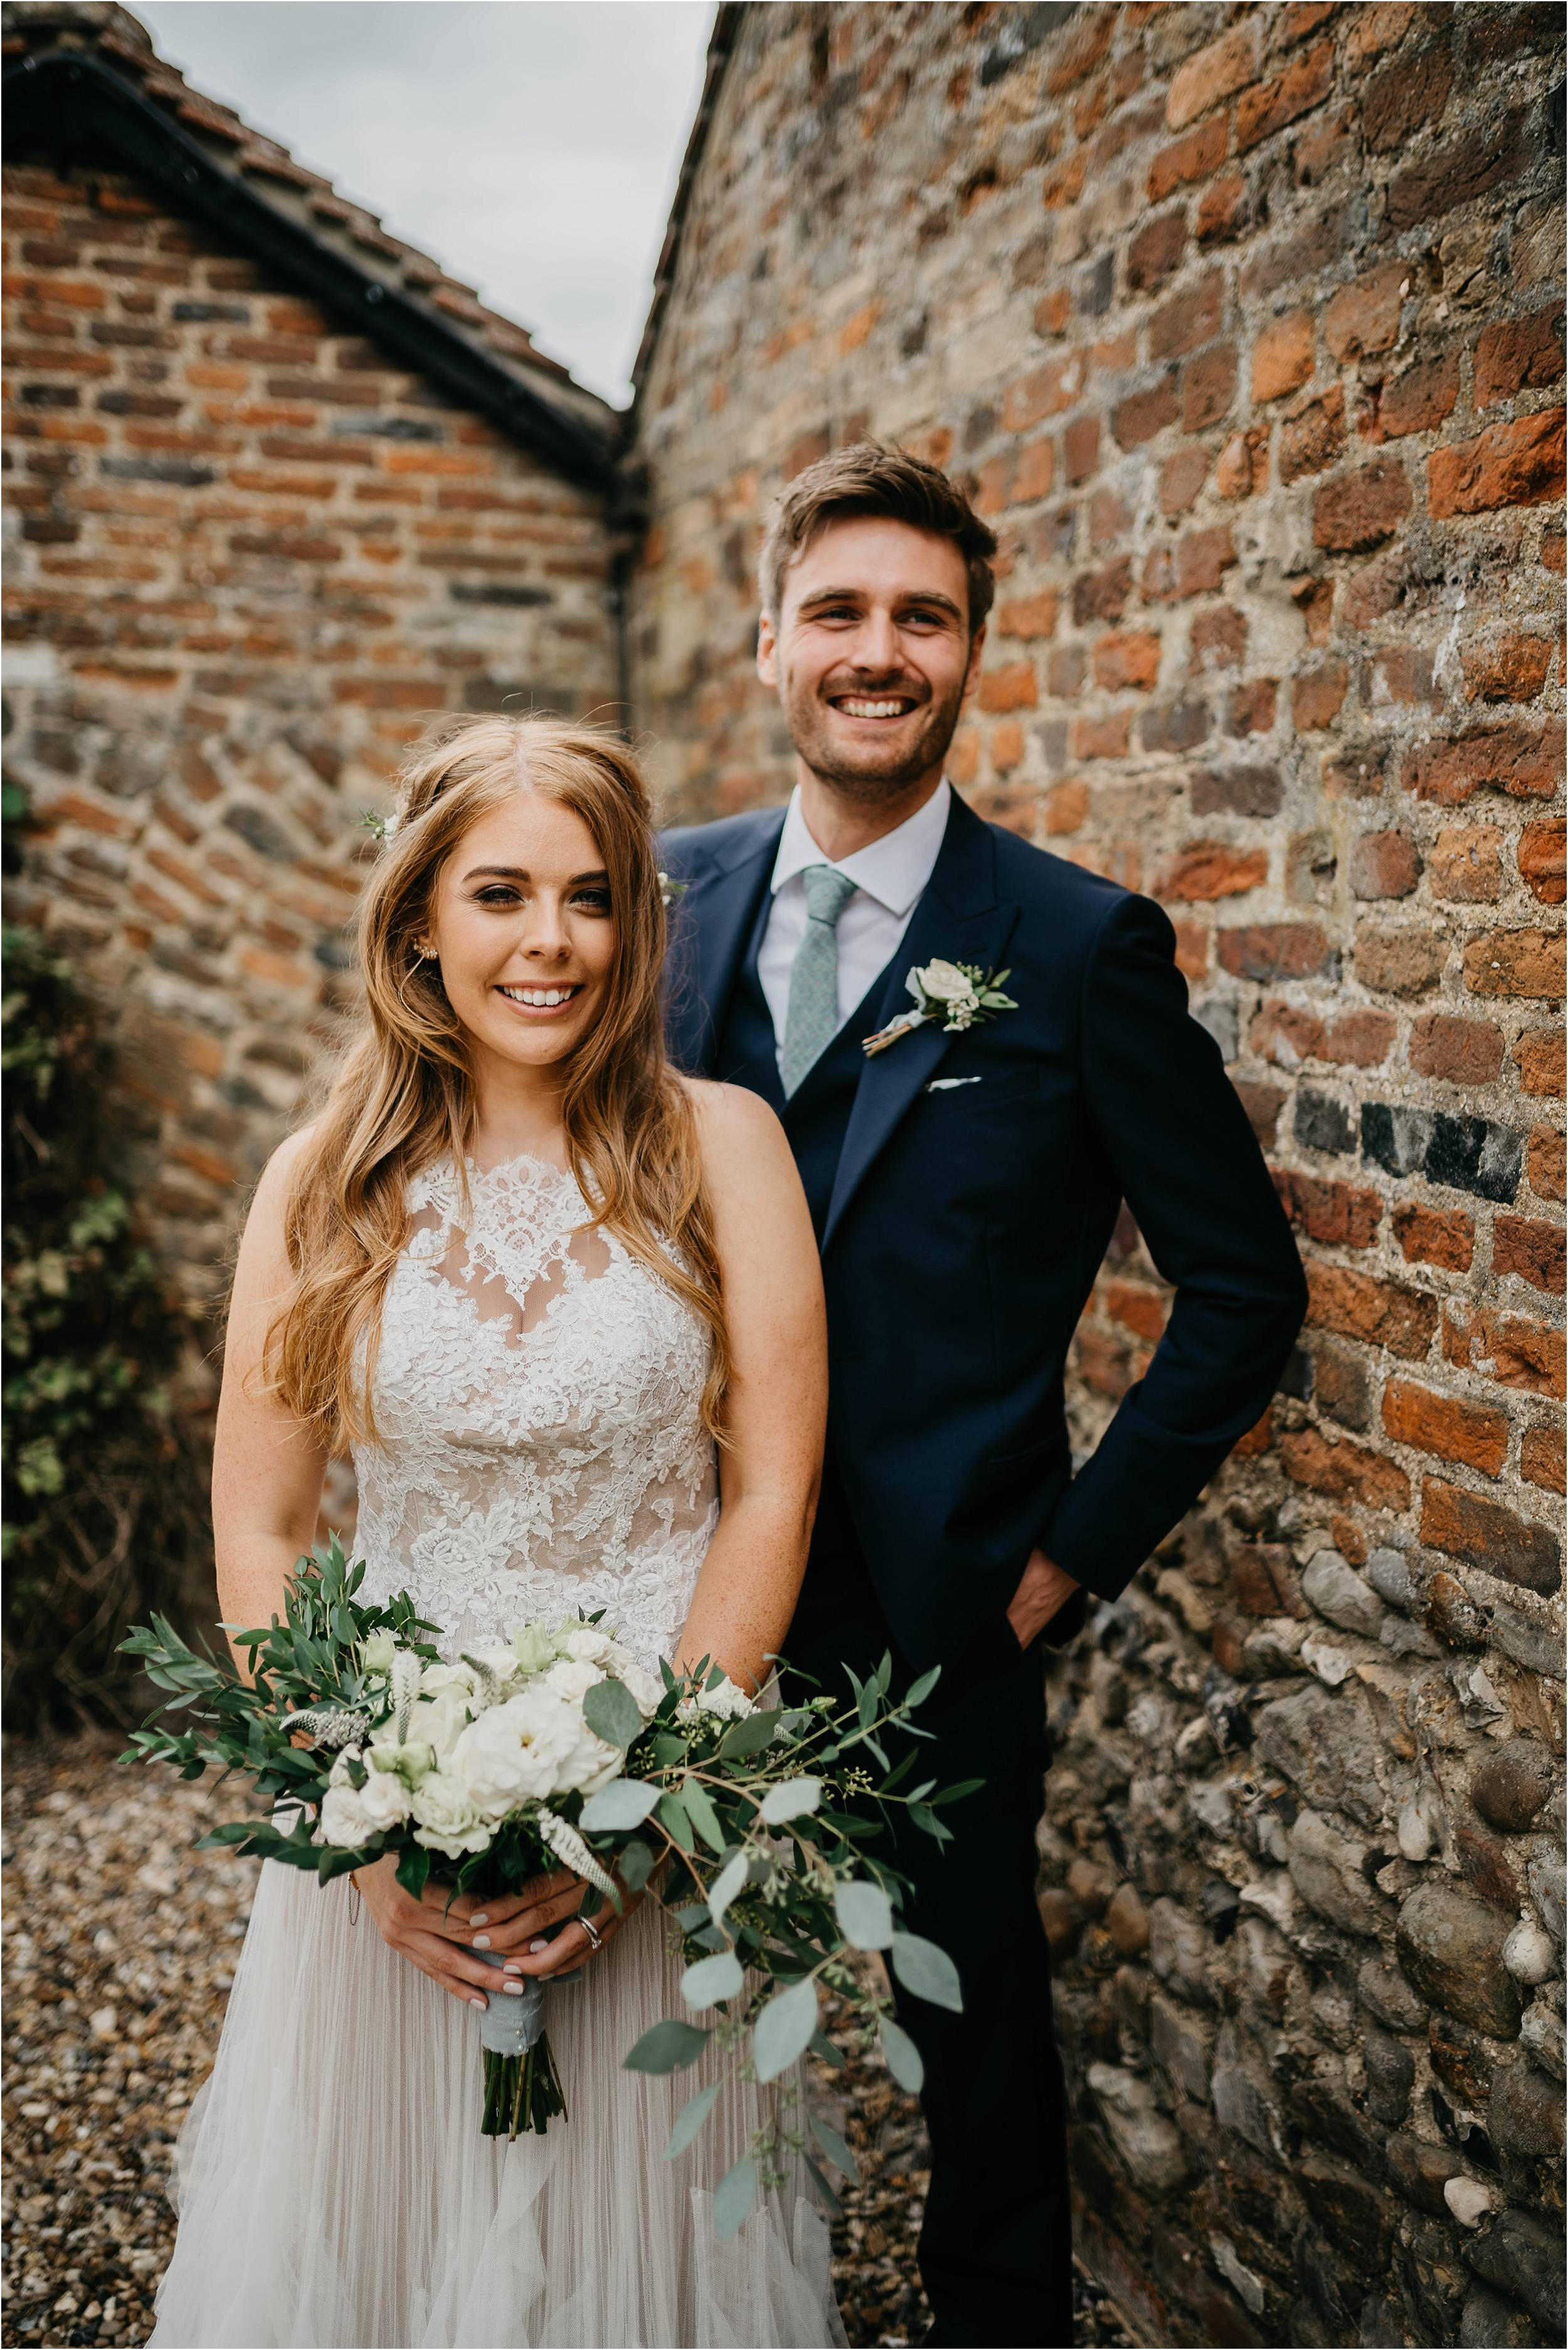 The Priory Little Wymondley Wedding Photography_0116.jpg